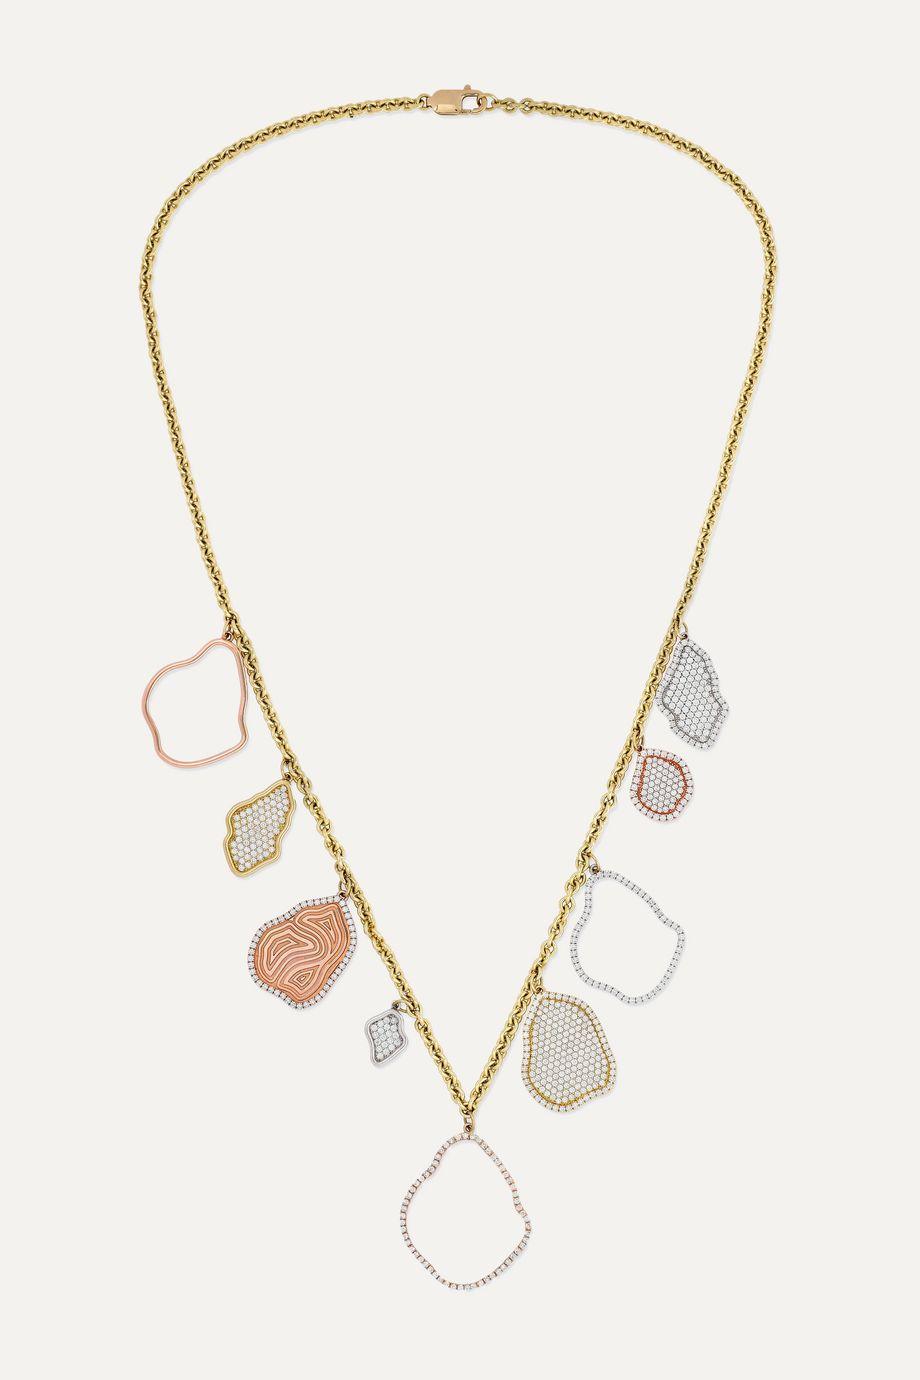 Kimberly McDonald 18-karat white, rose, yellow and green gold diamond necklace